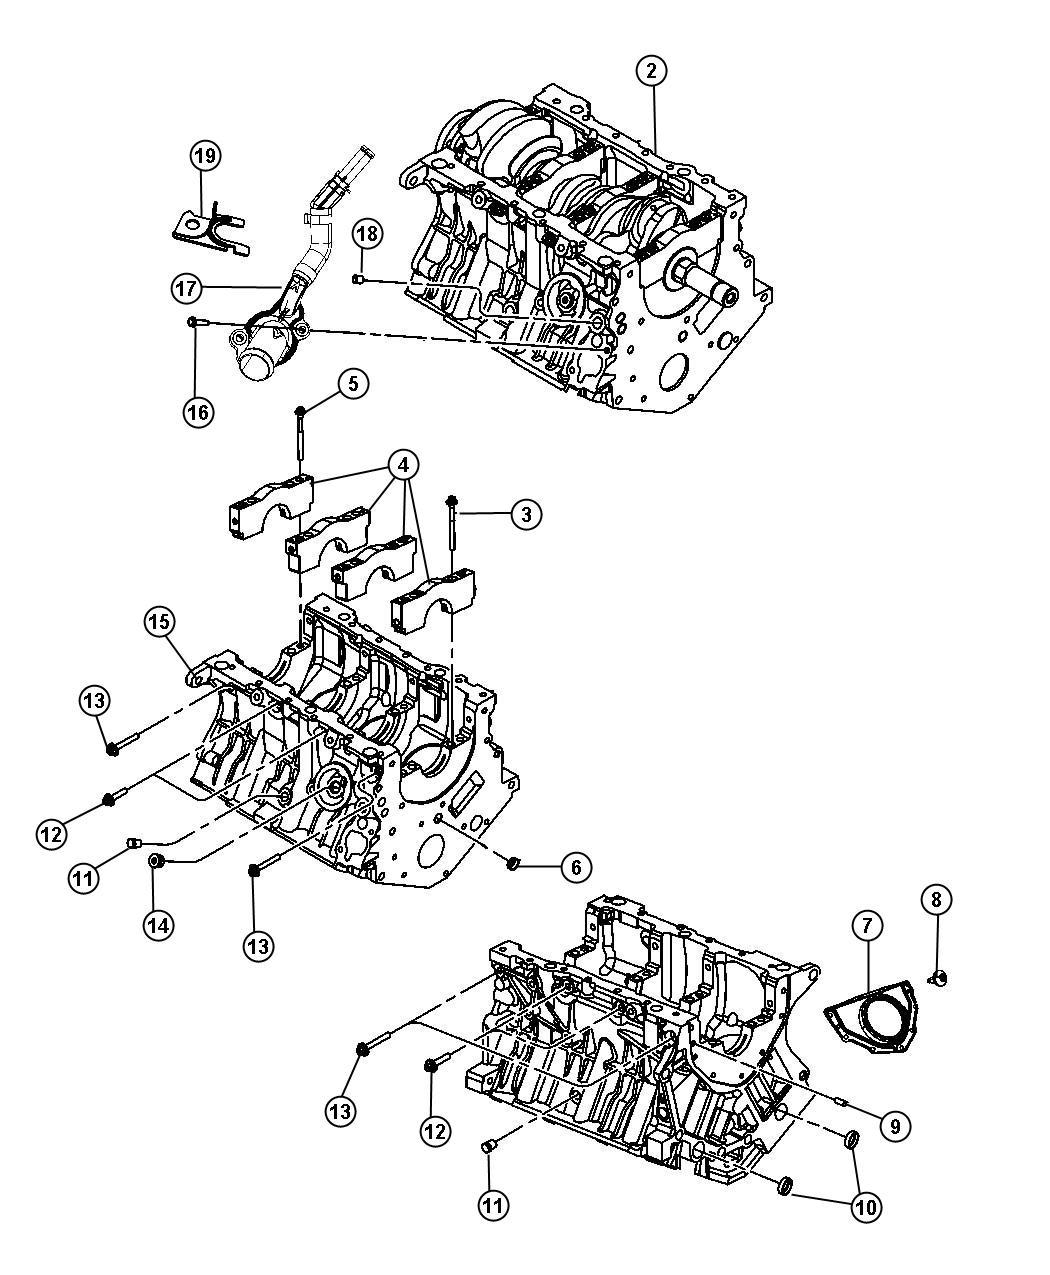 Dodge Charger Engine Long Block Export Oil Cooler